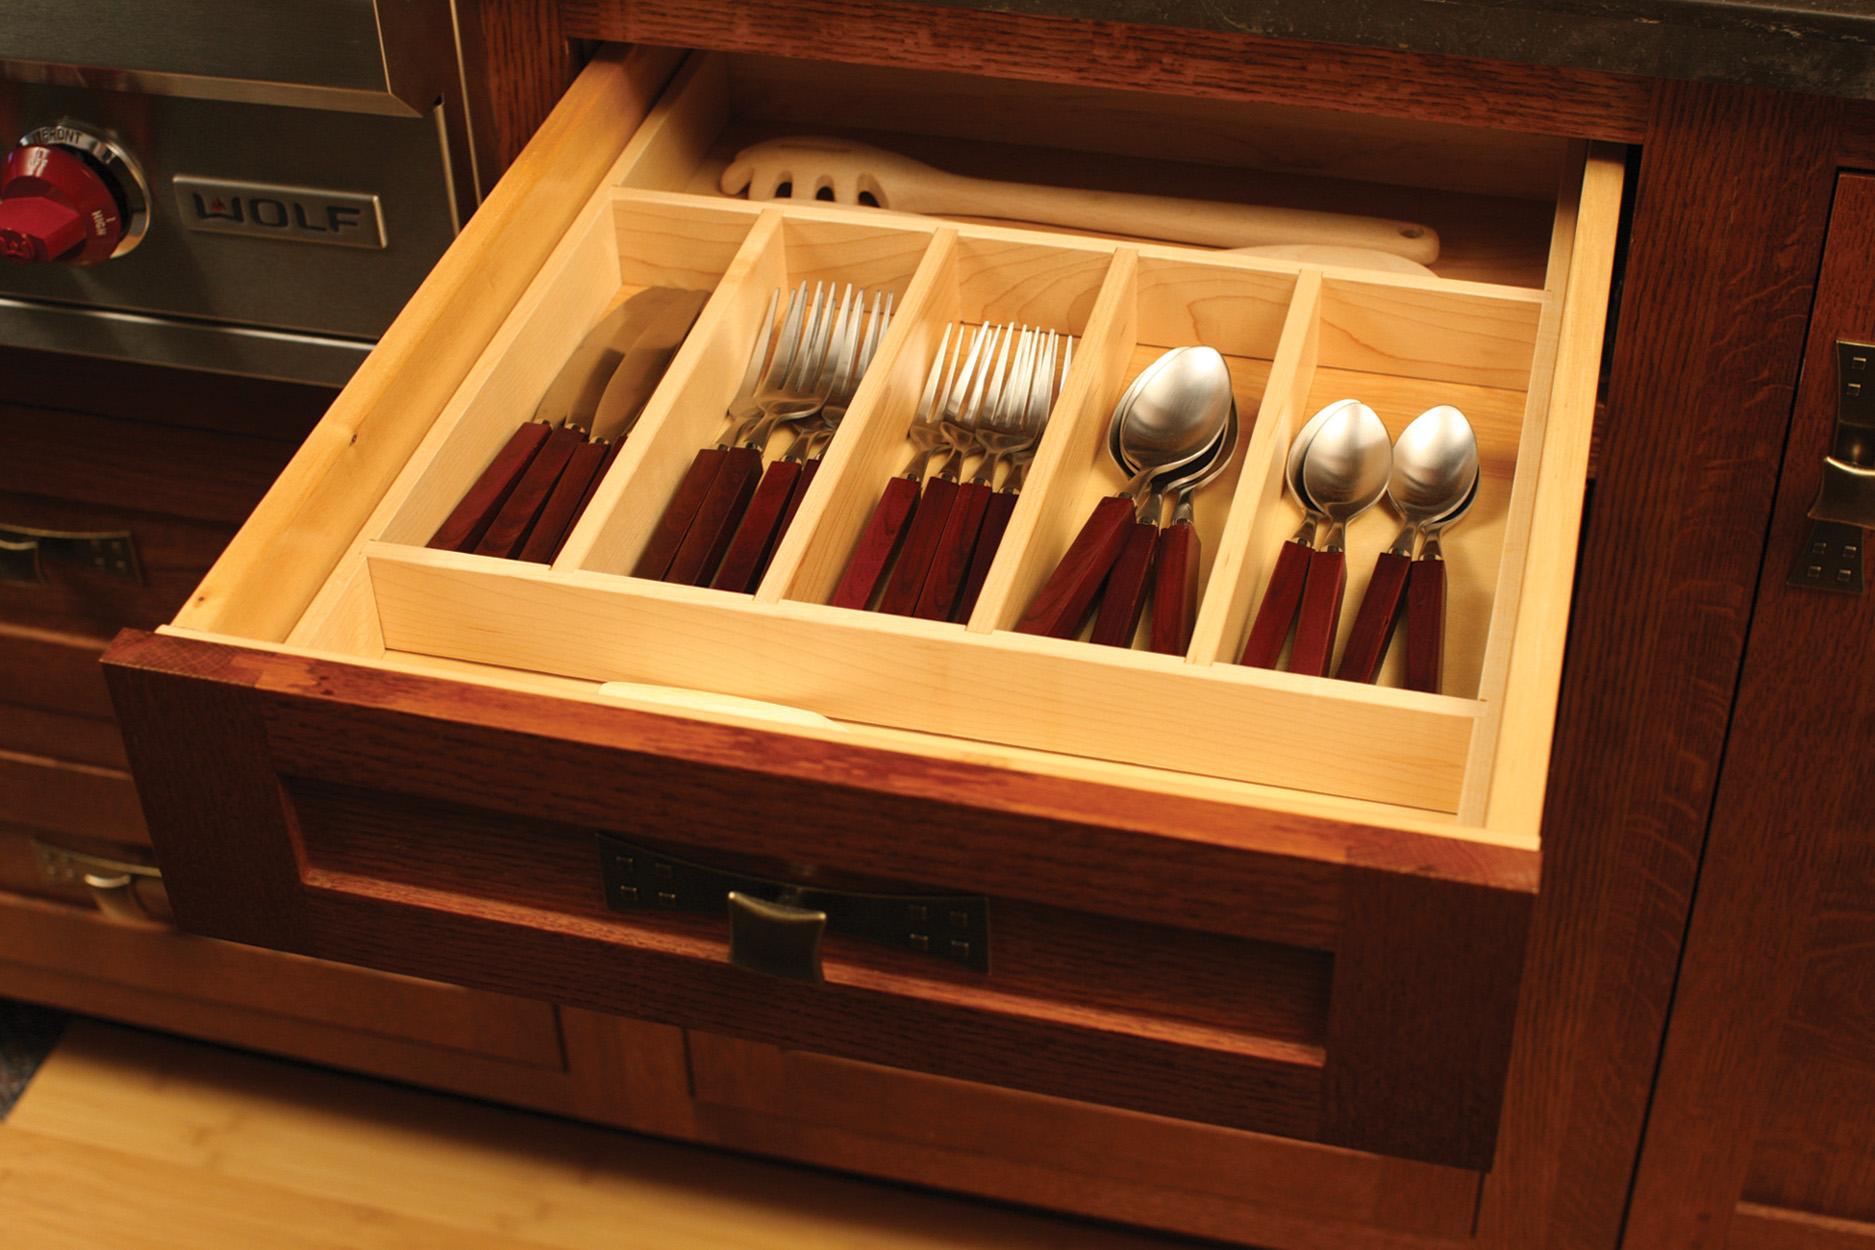 Cutlery Divider Tray